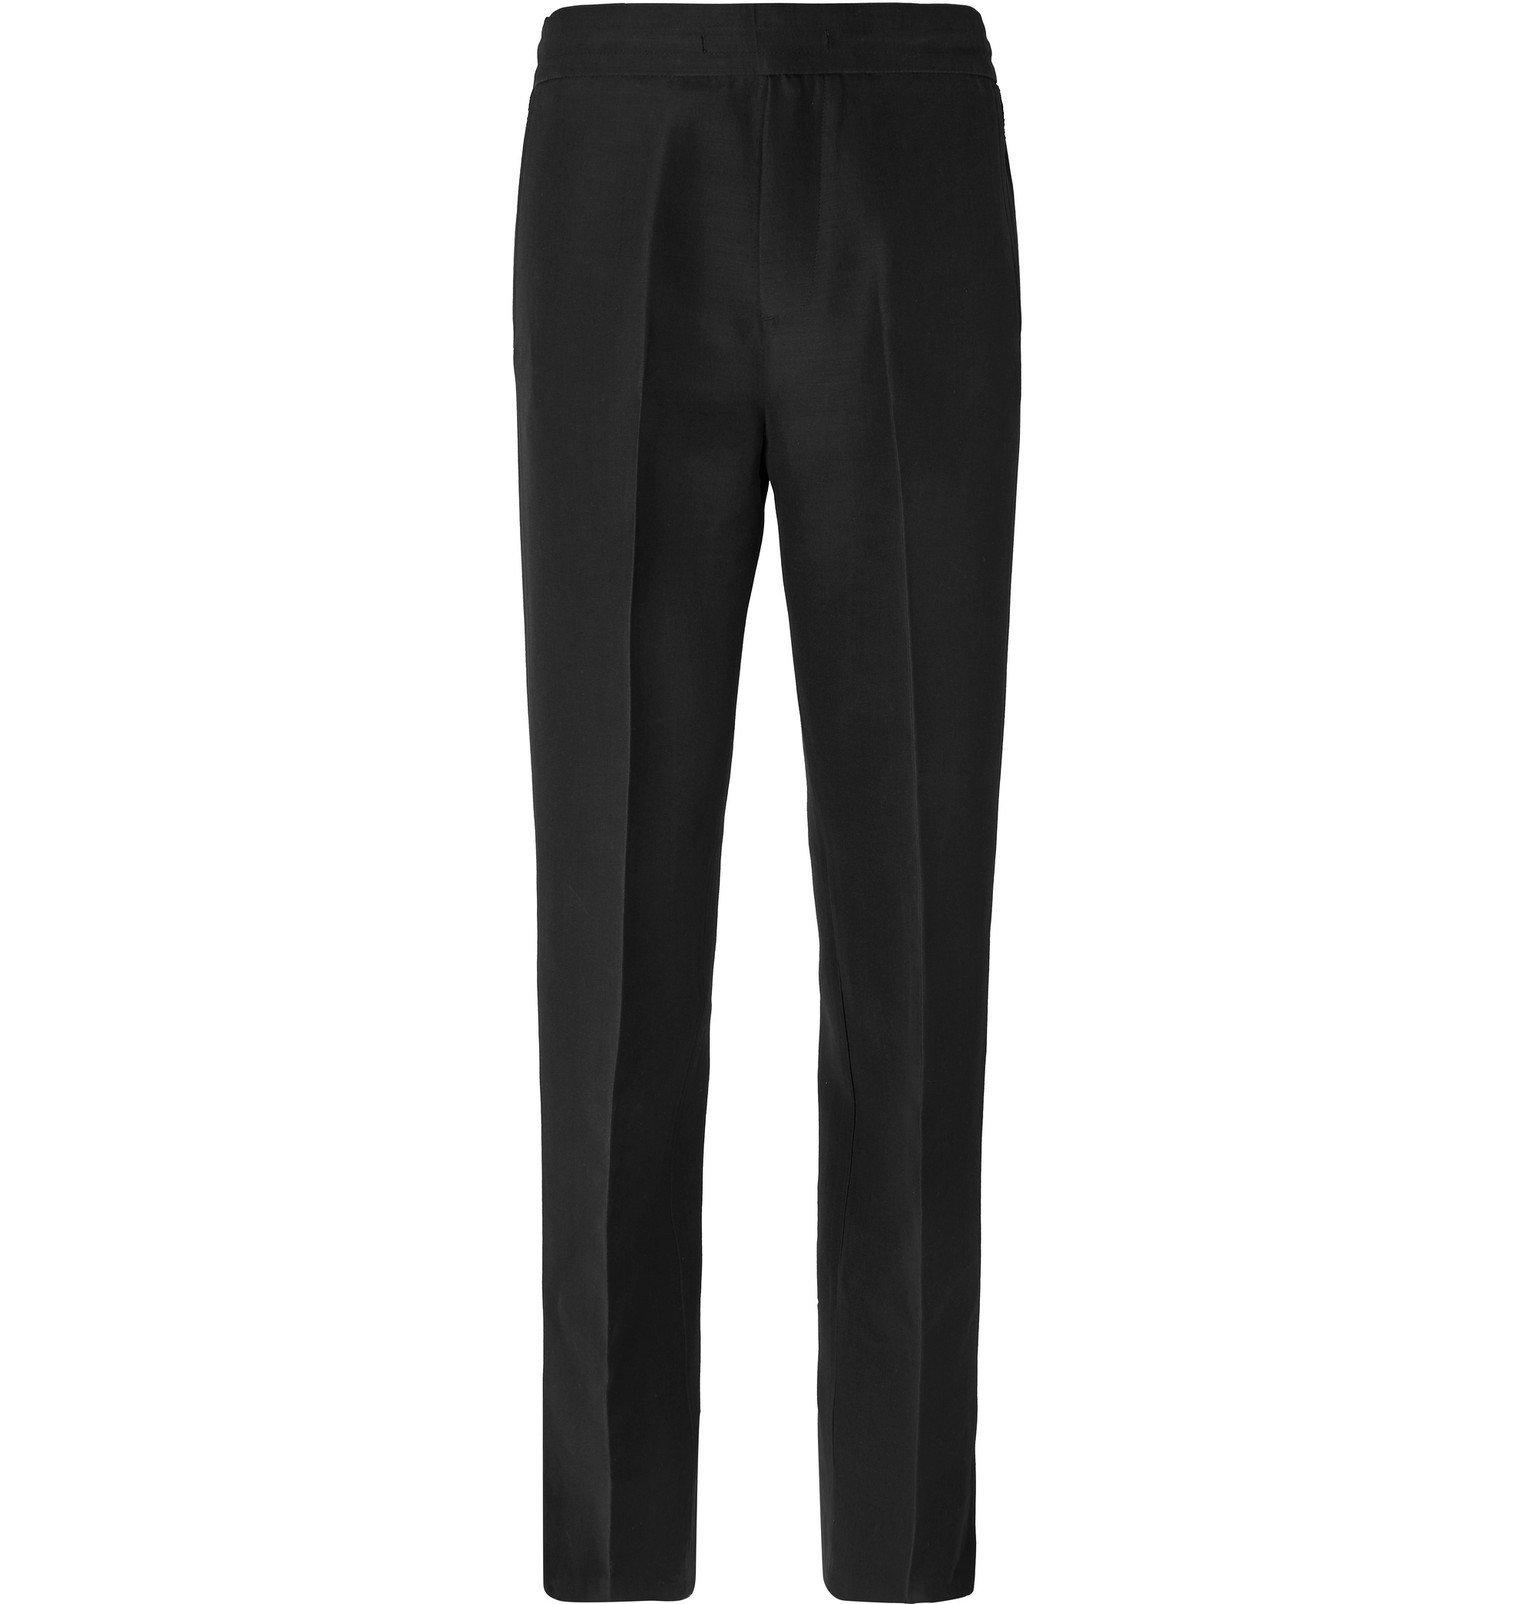 Dunhill - Black Wide-Leg Split-Hem Silk and Virgin Wool-Blend Trousers - Black